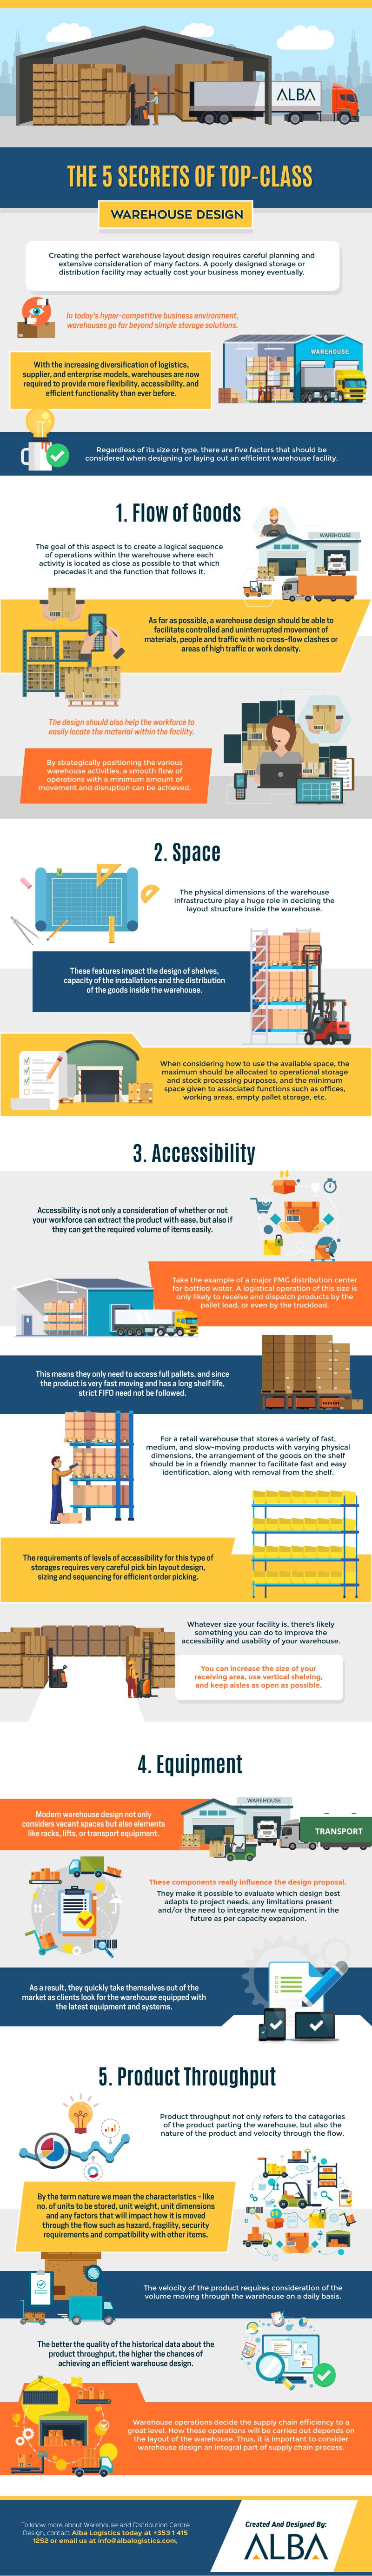 The 5 Secrets of Top-Class Warehouse Design-01